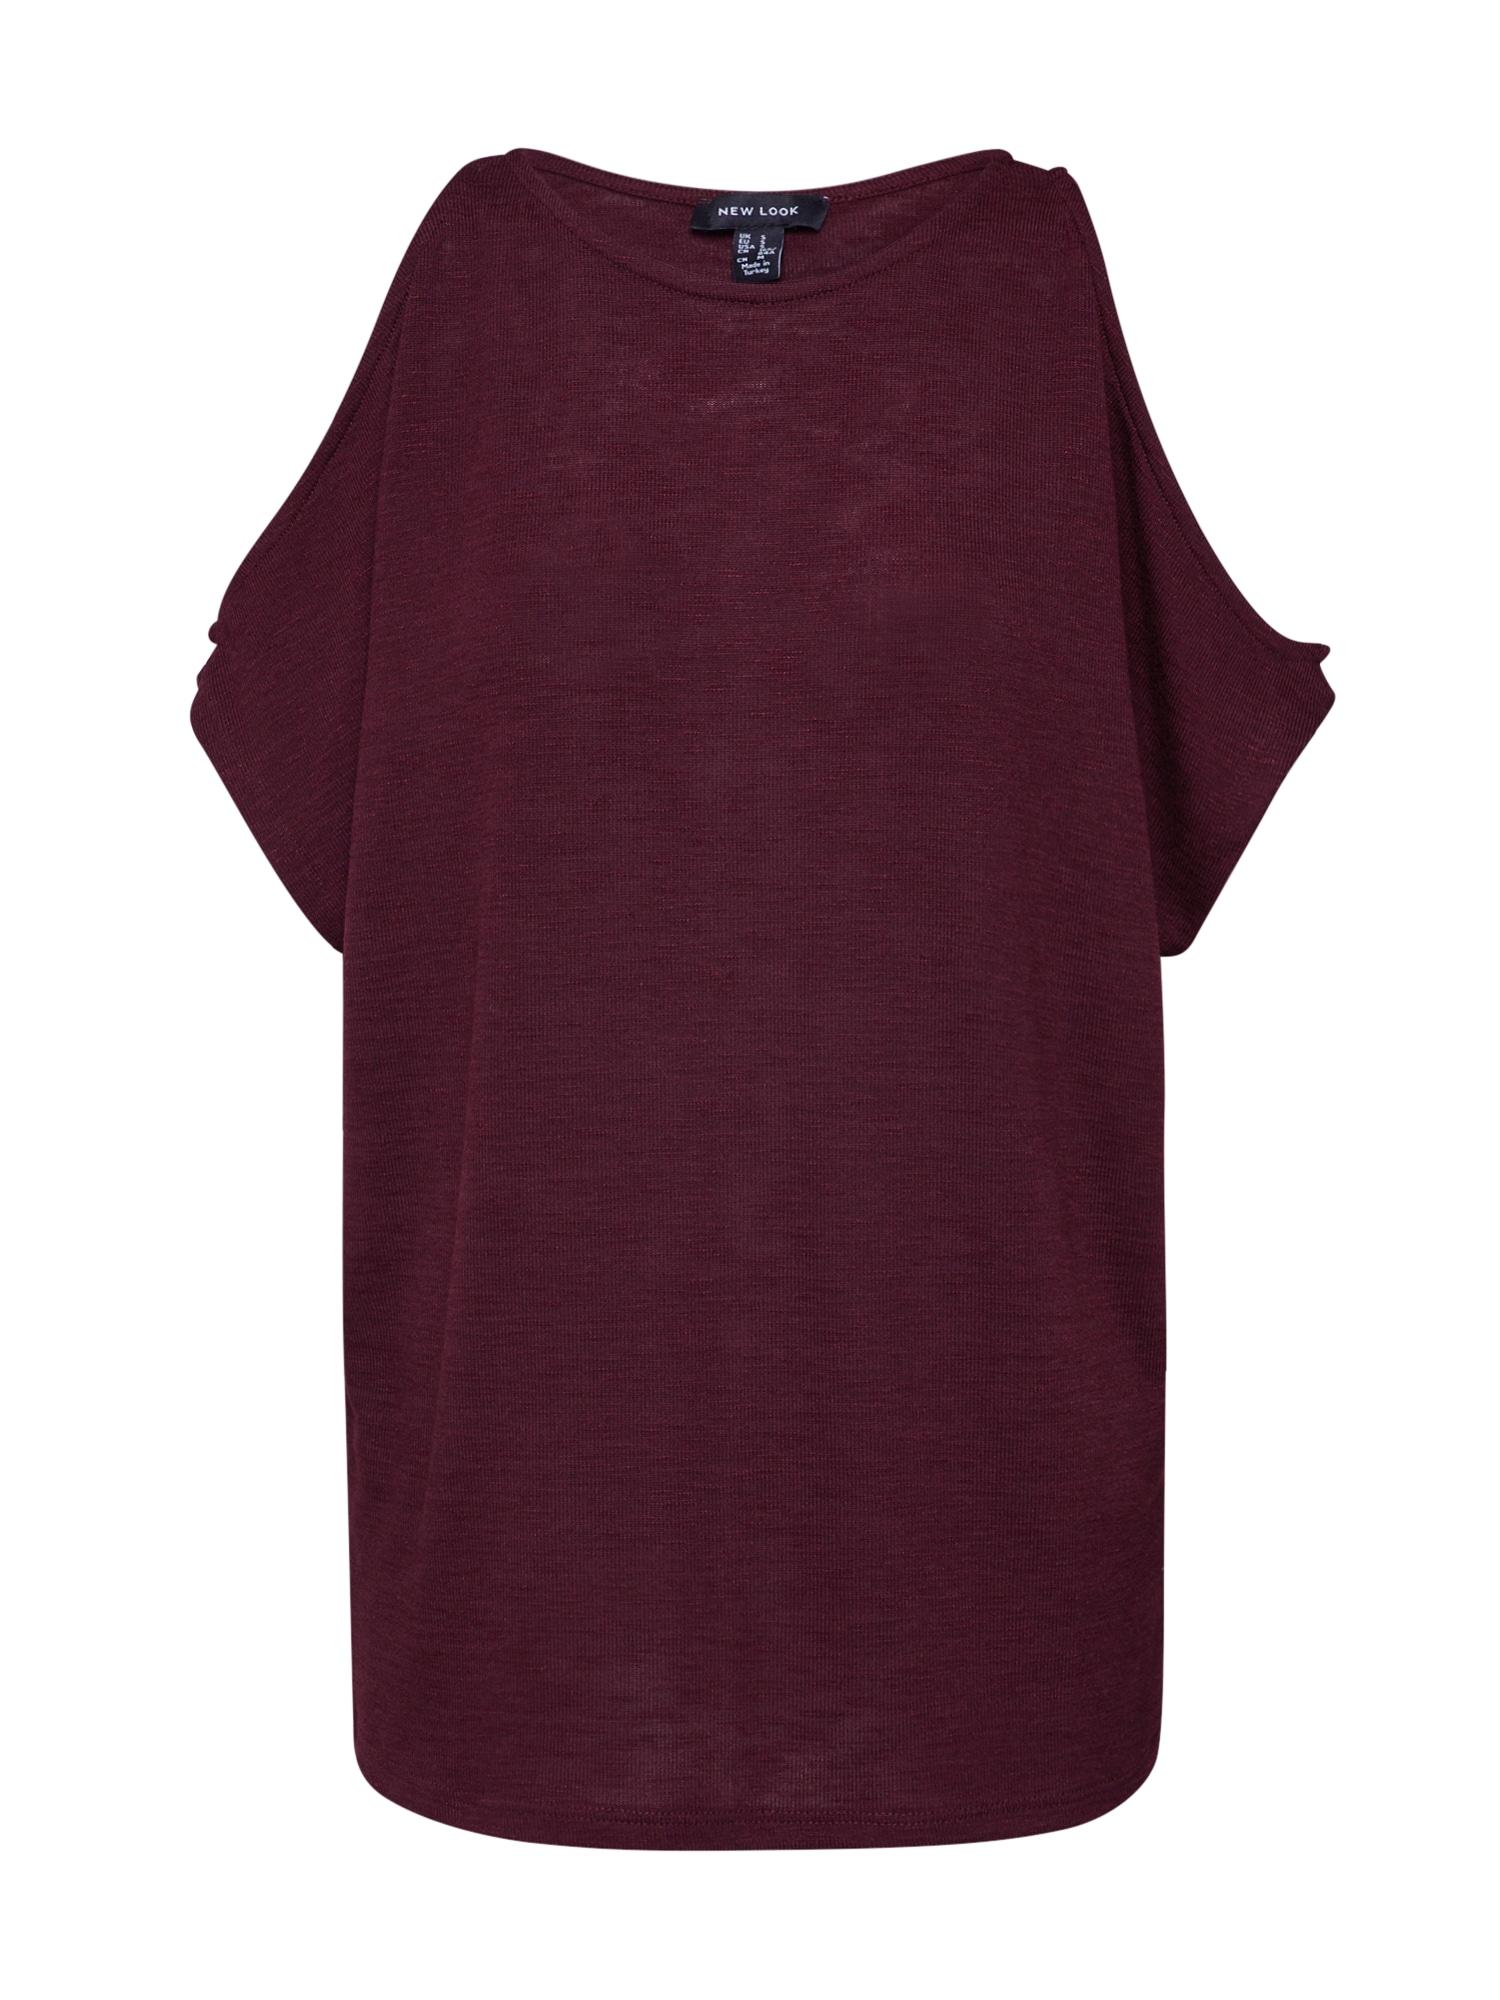 NEW LOOK Tričko 'CS COLD SHOULDER TOP'  burgundská červeň